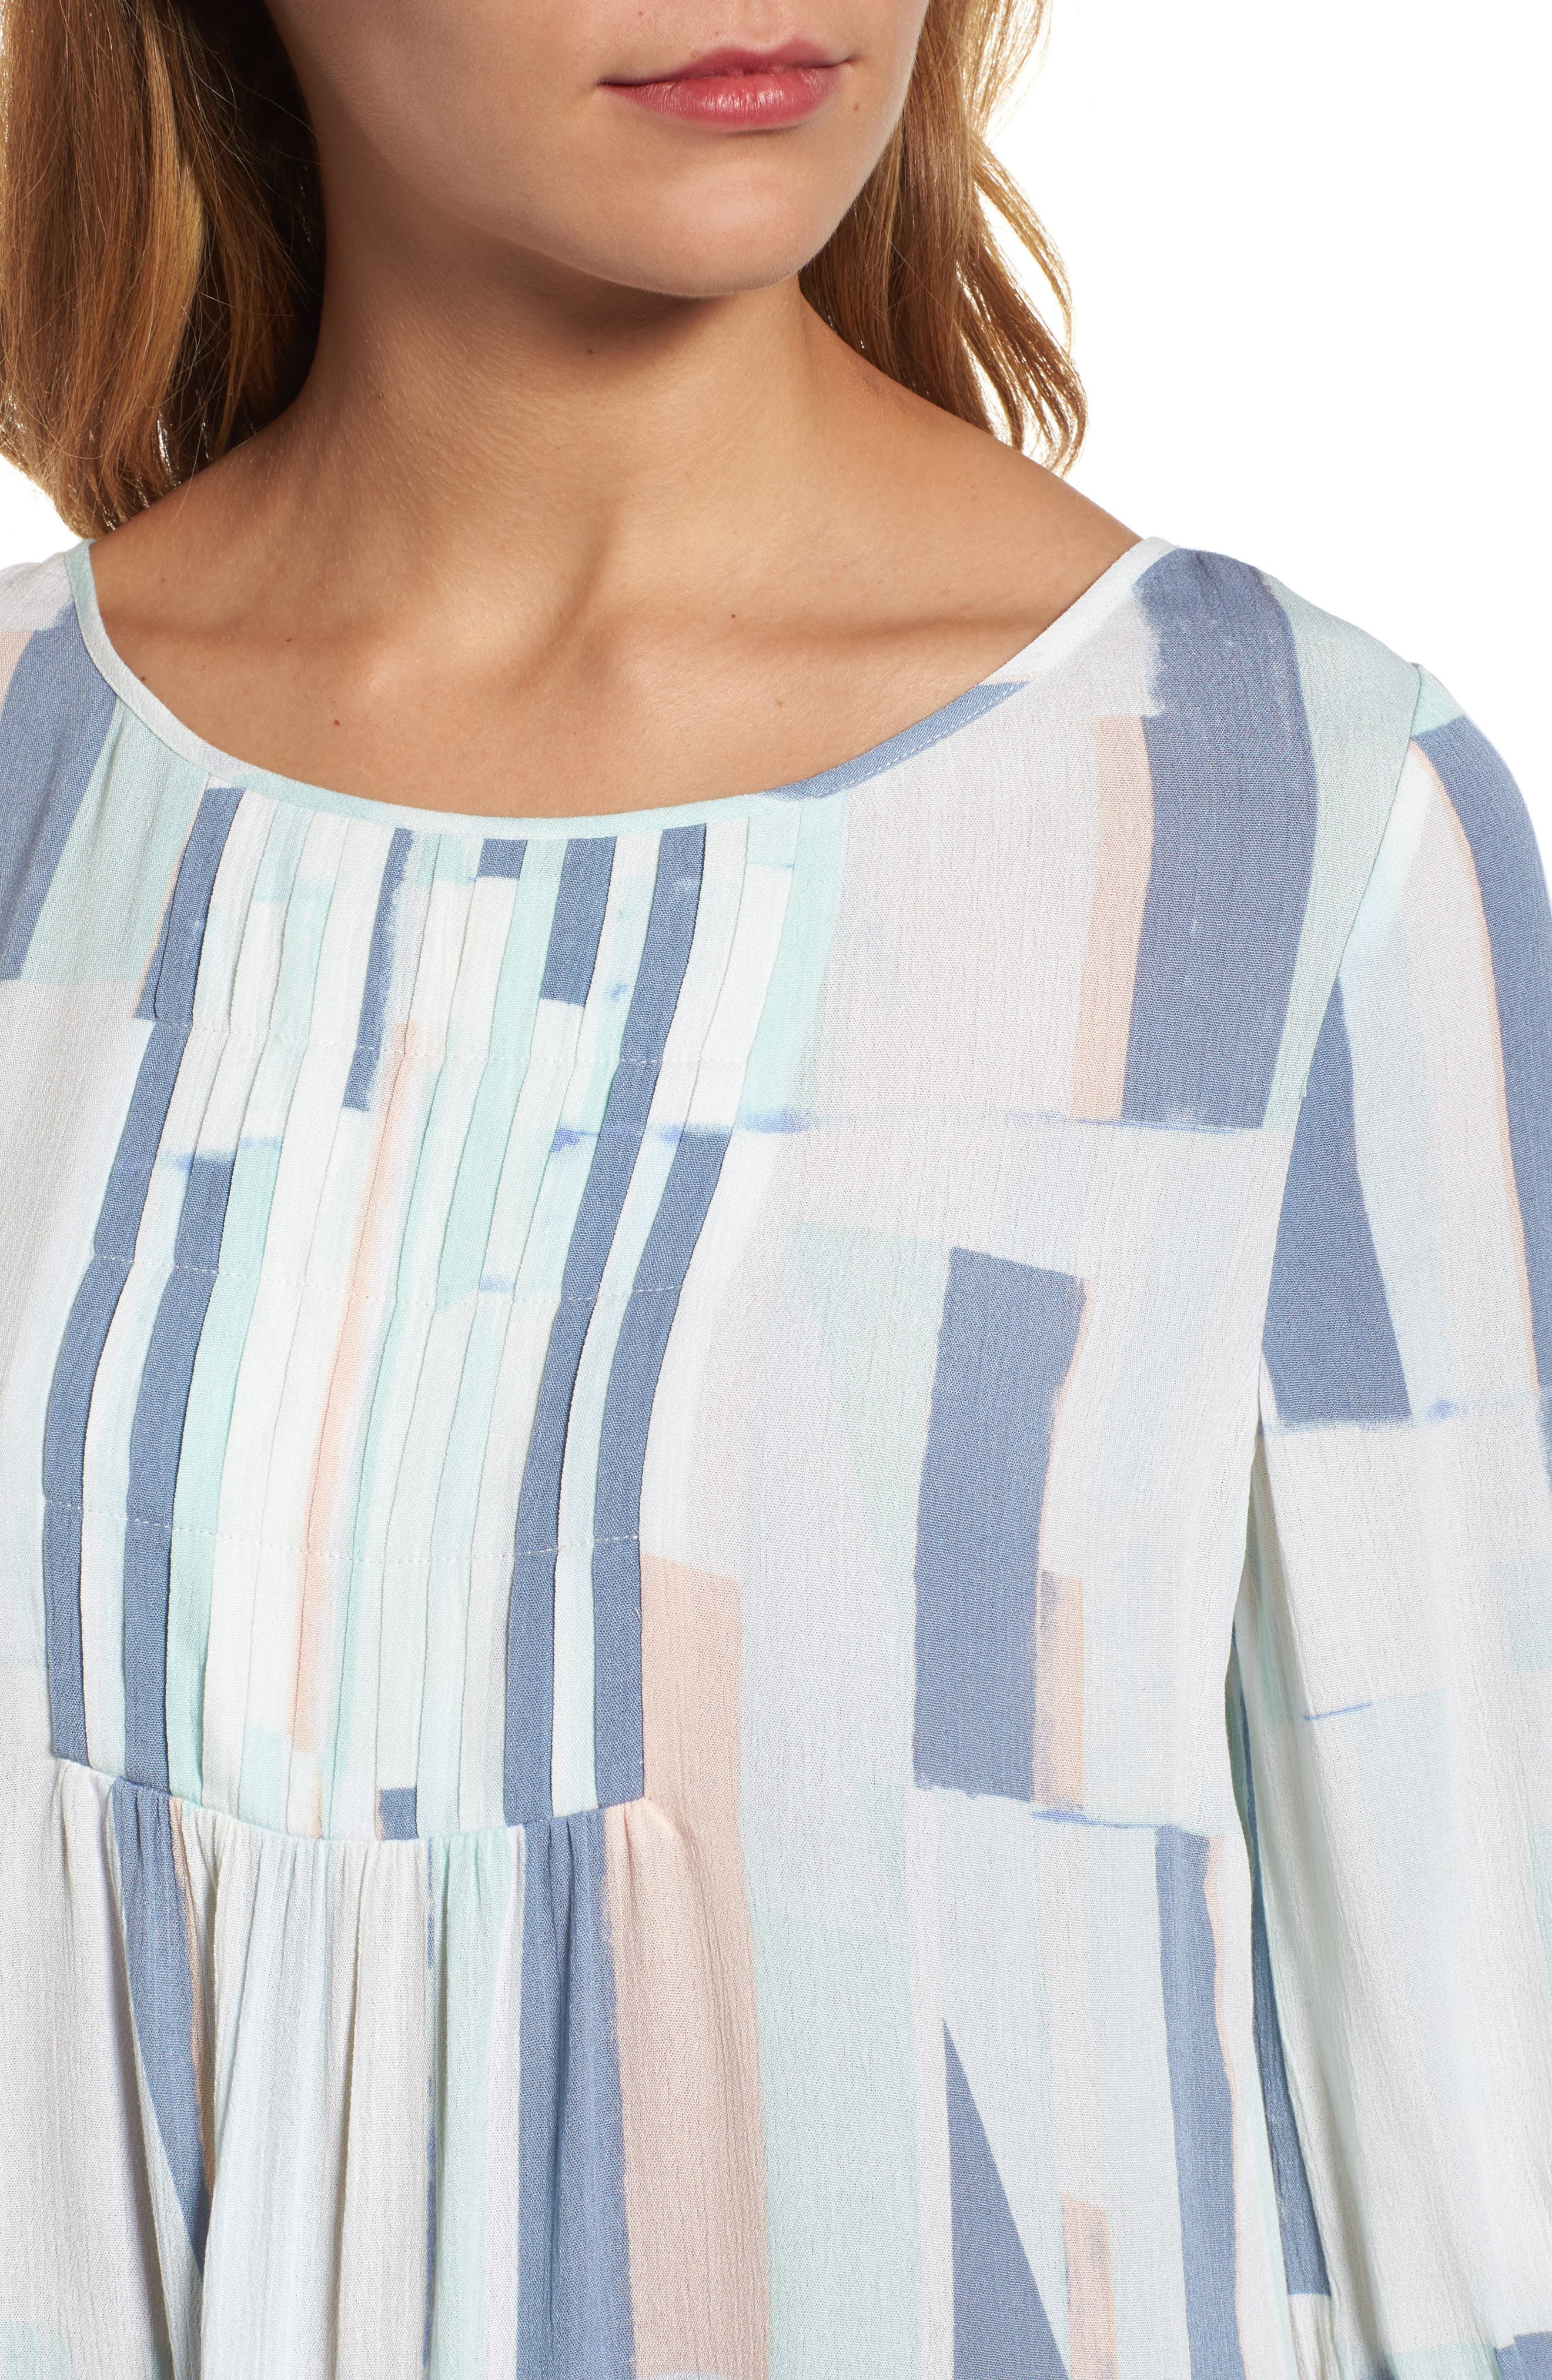 Printed Tie Sleeve Blouse,                             Alternate thumbnail 4, color,                             Teal- White Geo